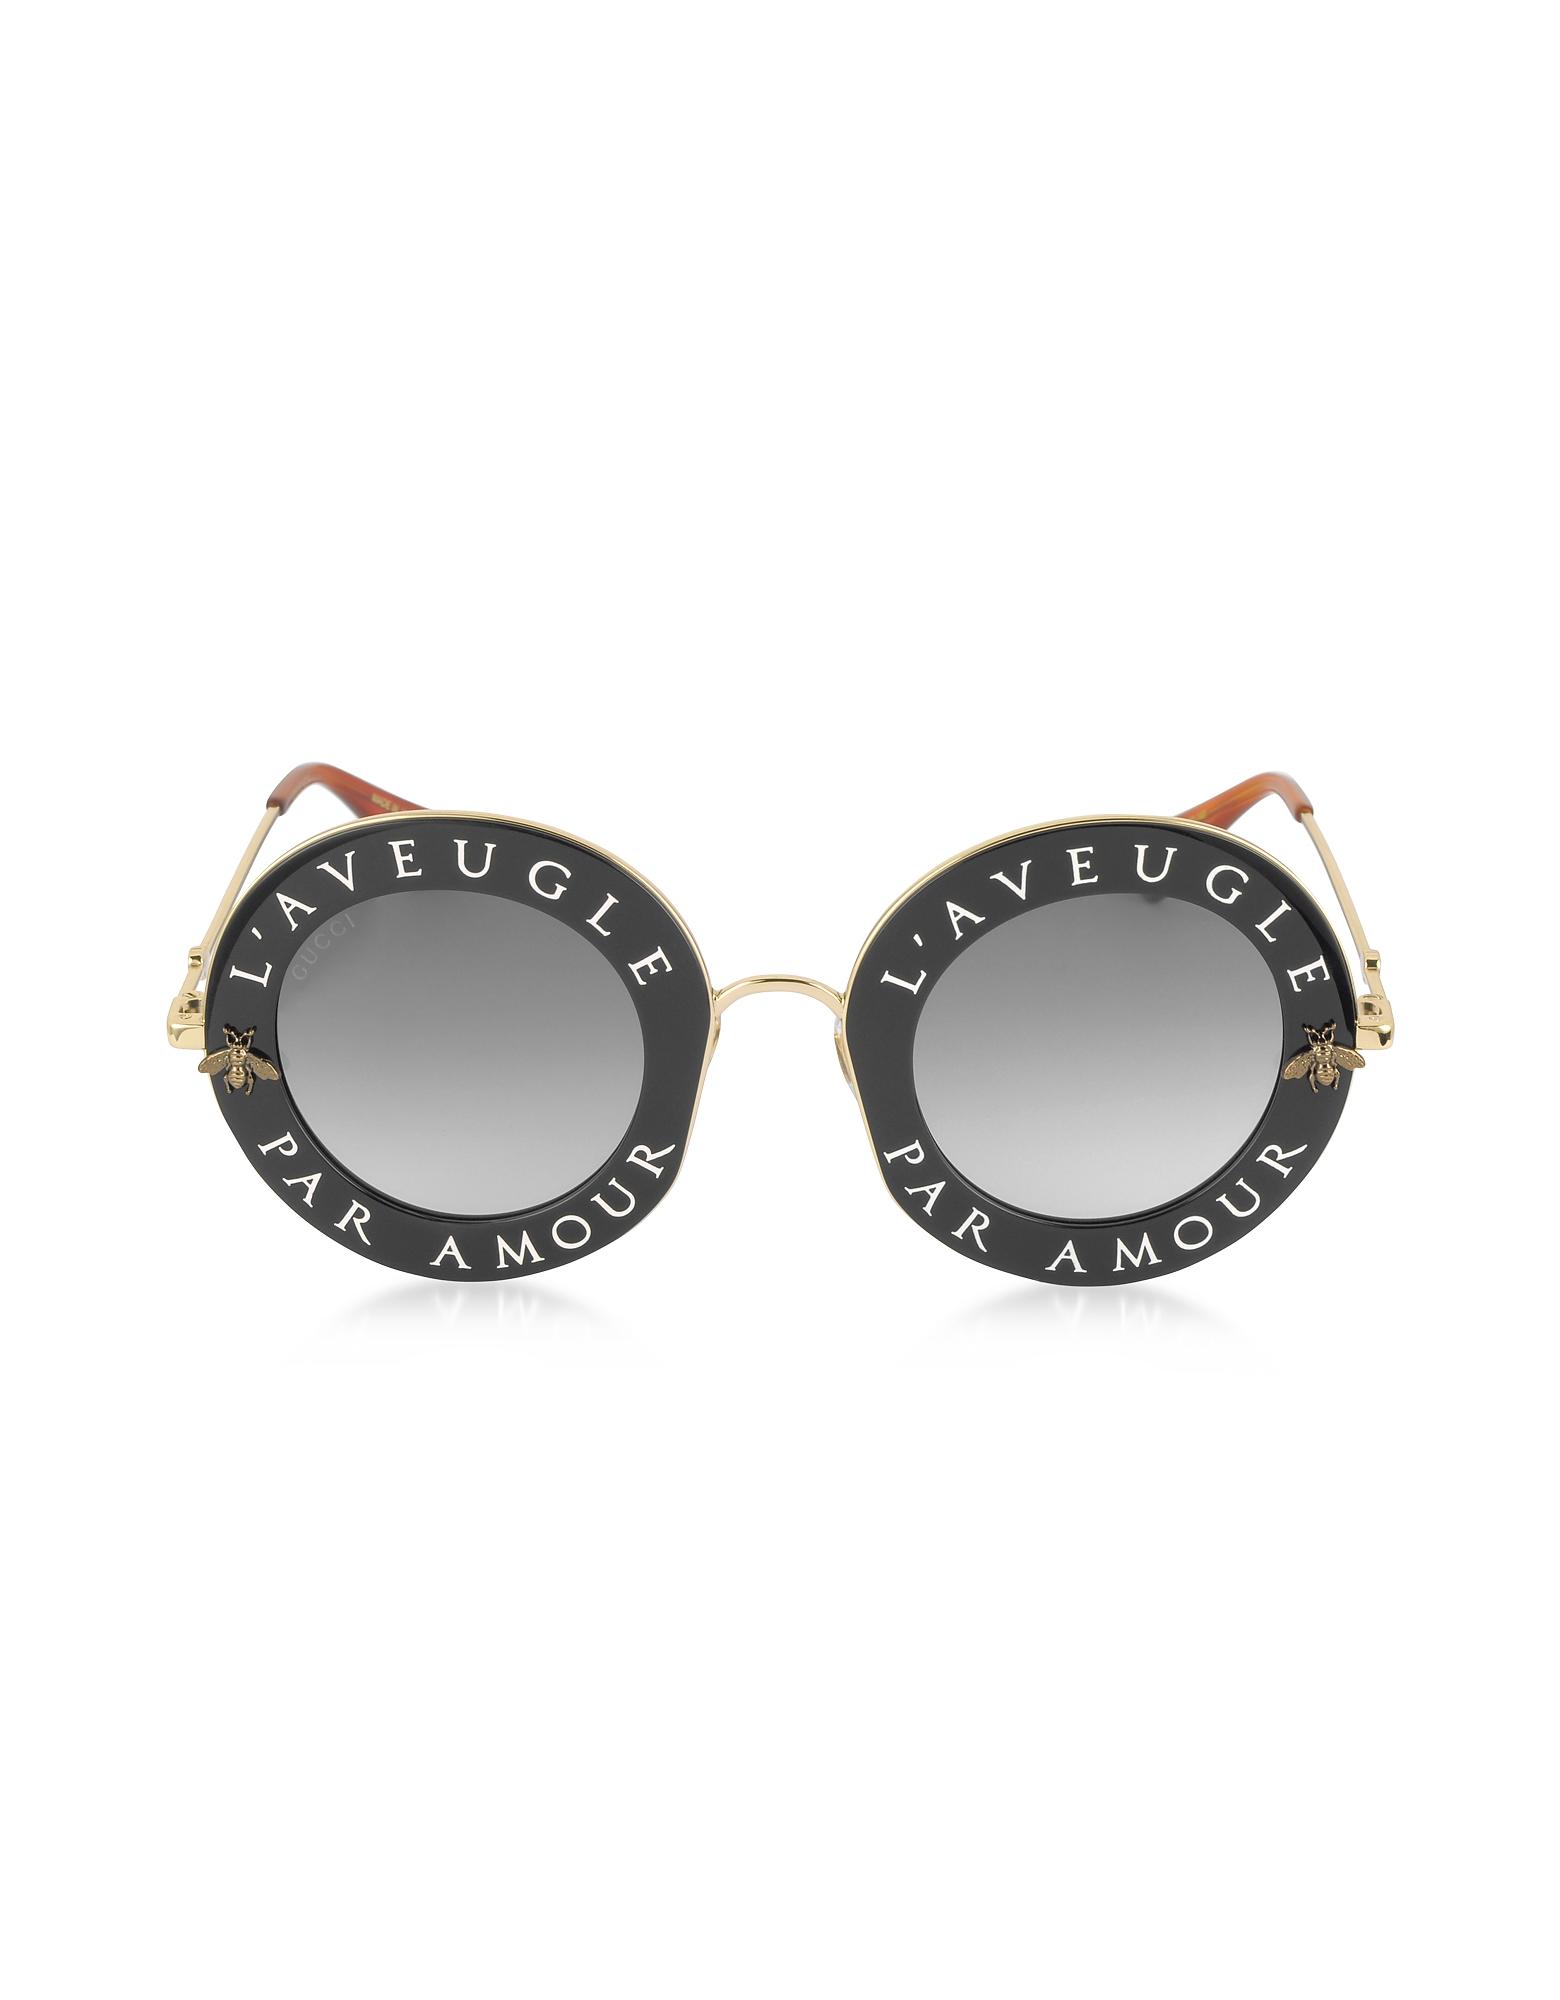 Gucci Sunglasses, GG0113S Acetate and Gold Metal Round Women's Sunglasses